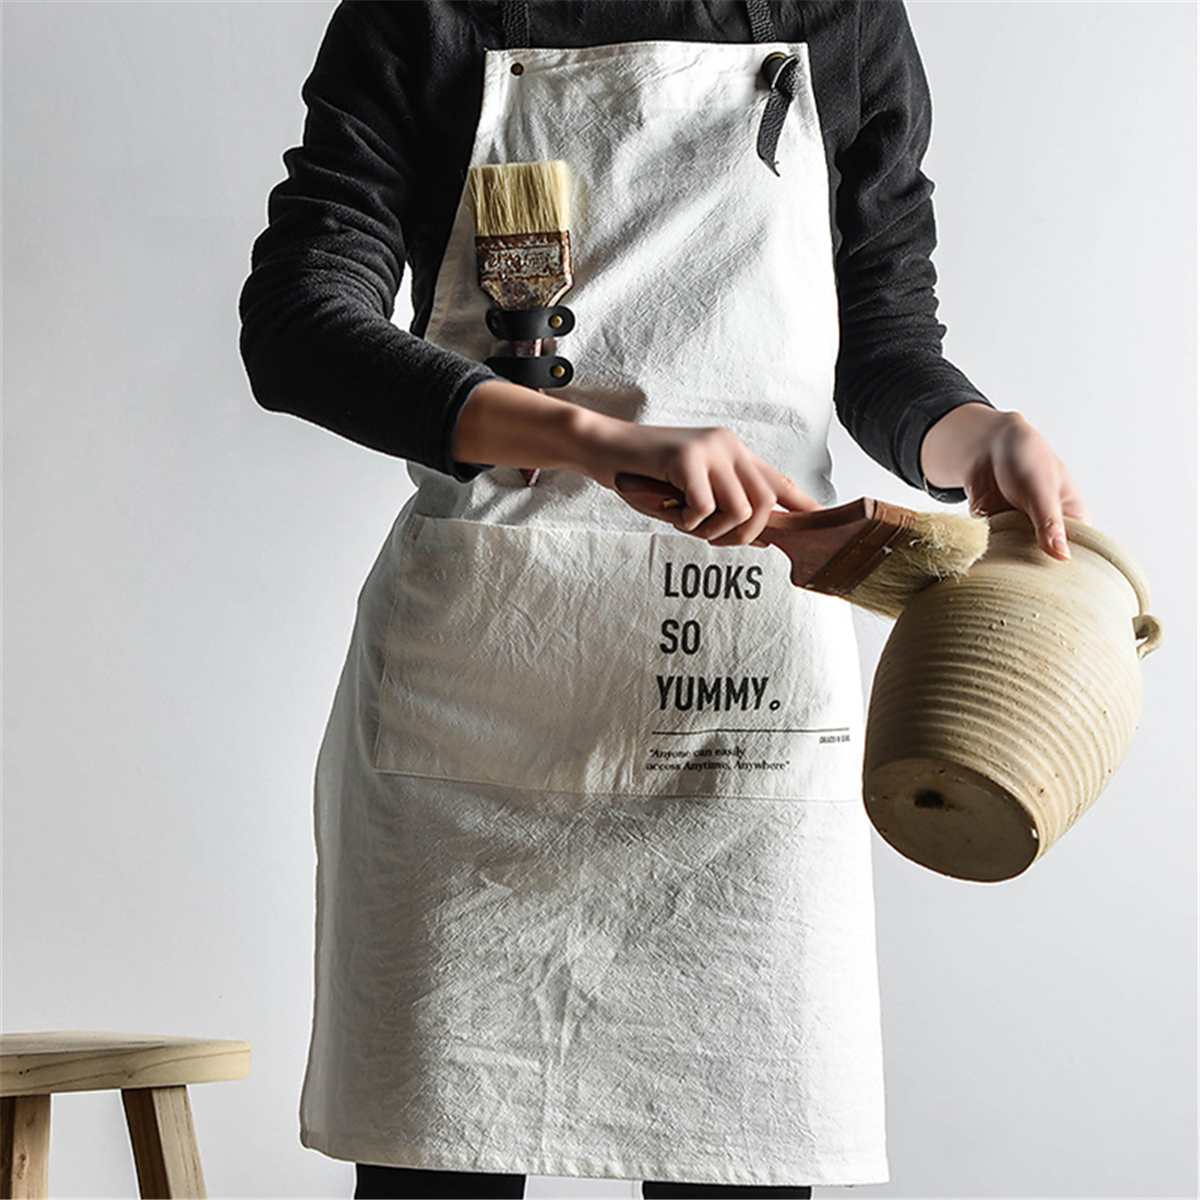 Adjustable Solid Color Apron with Pockets Cotton Cooking Kitchen Bar Apron LI